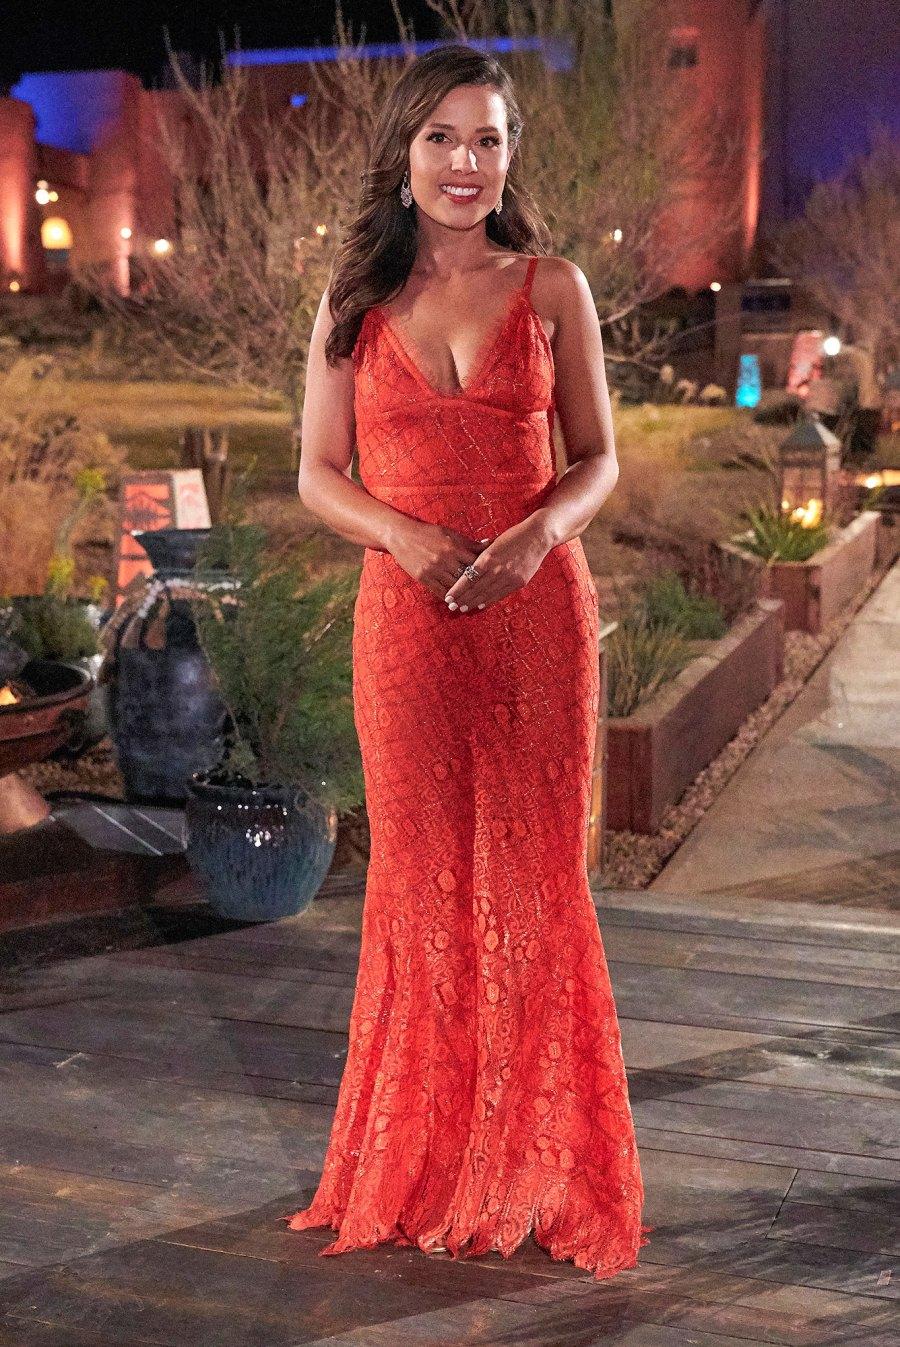 Katie Thurston Bachelorette Orange Gown 2